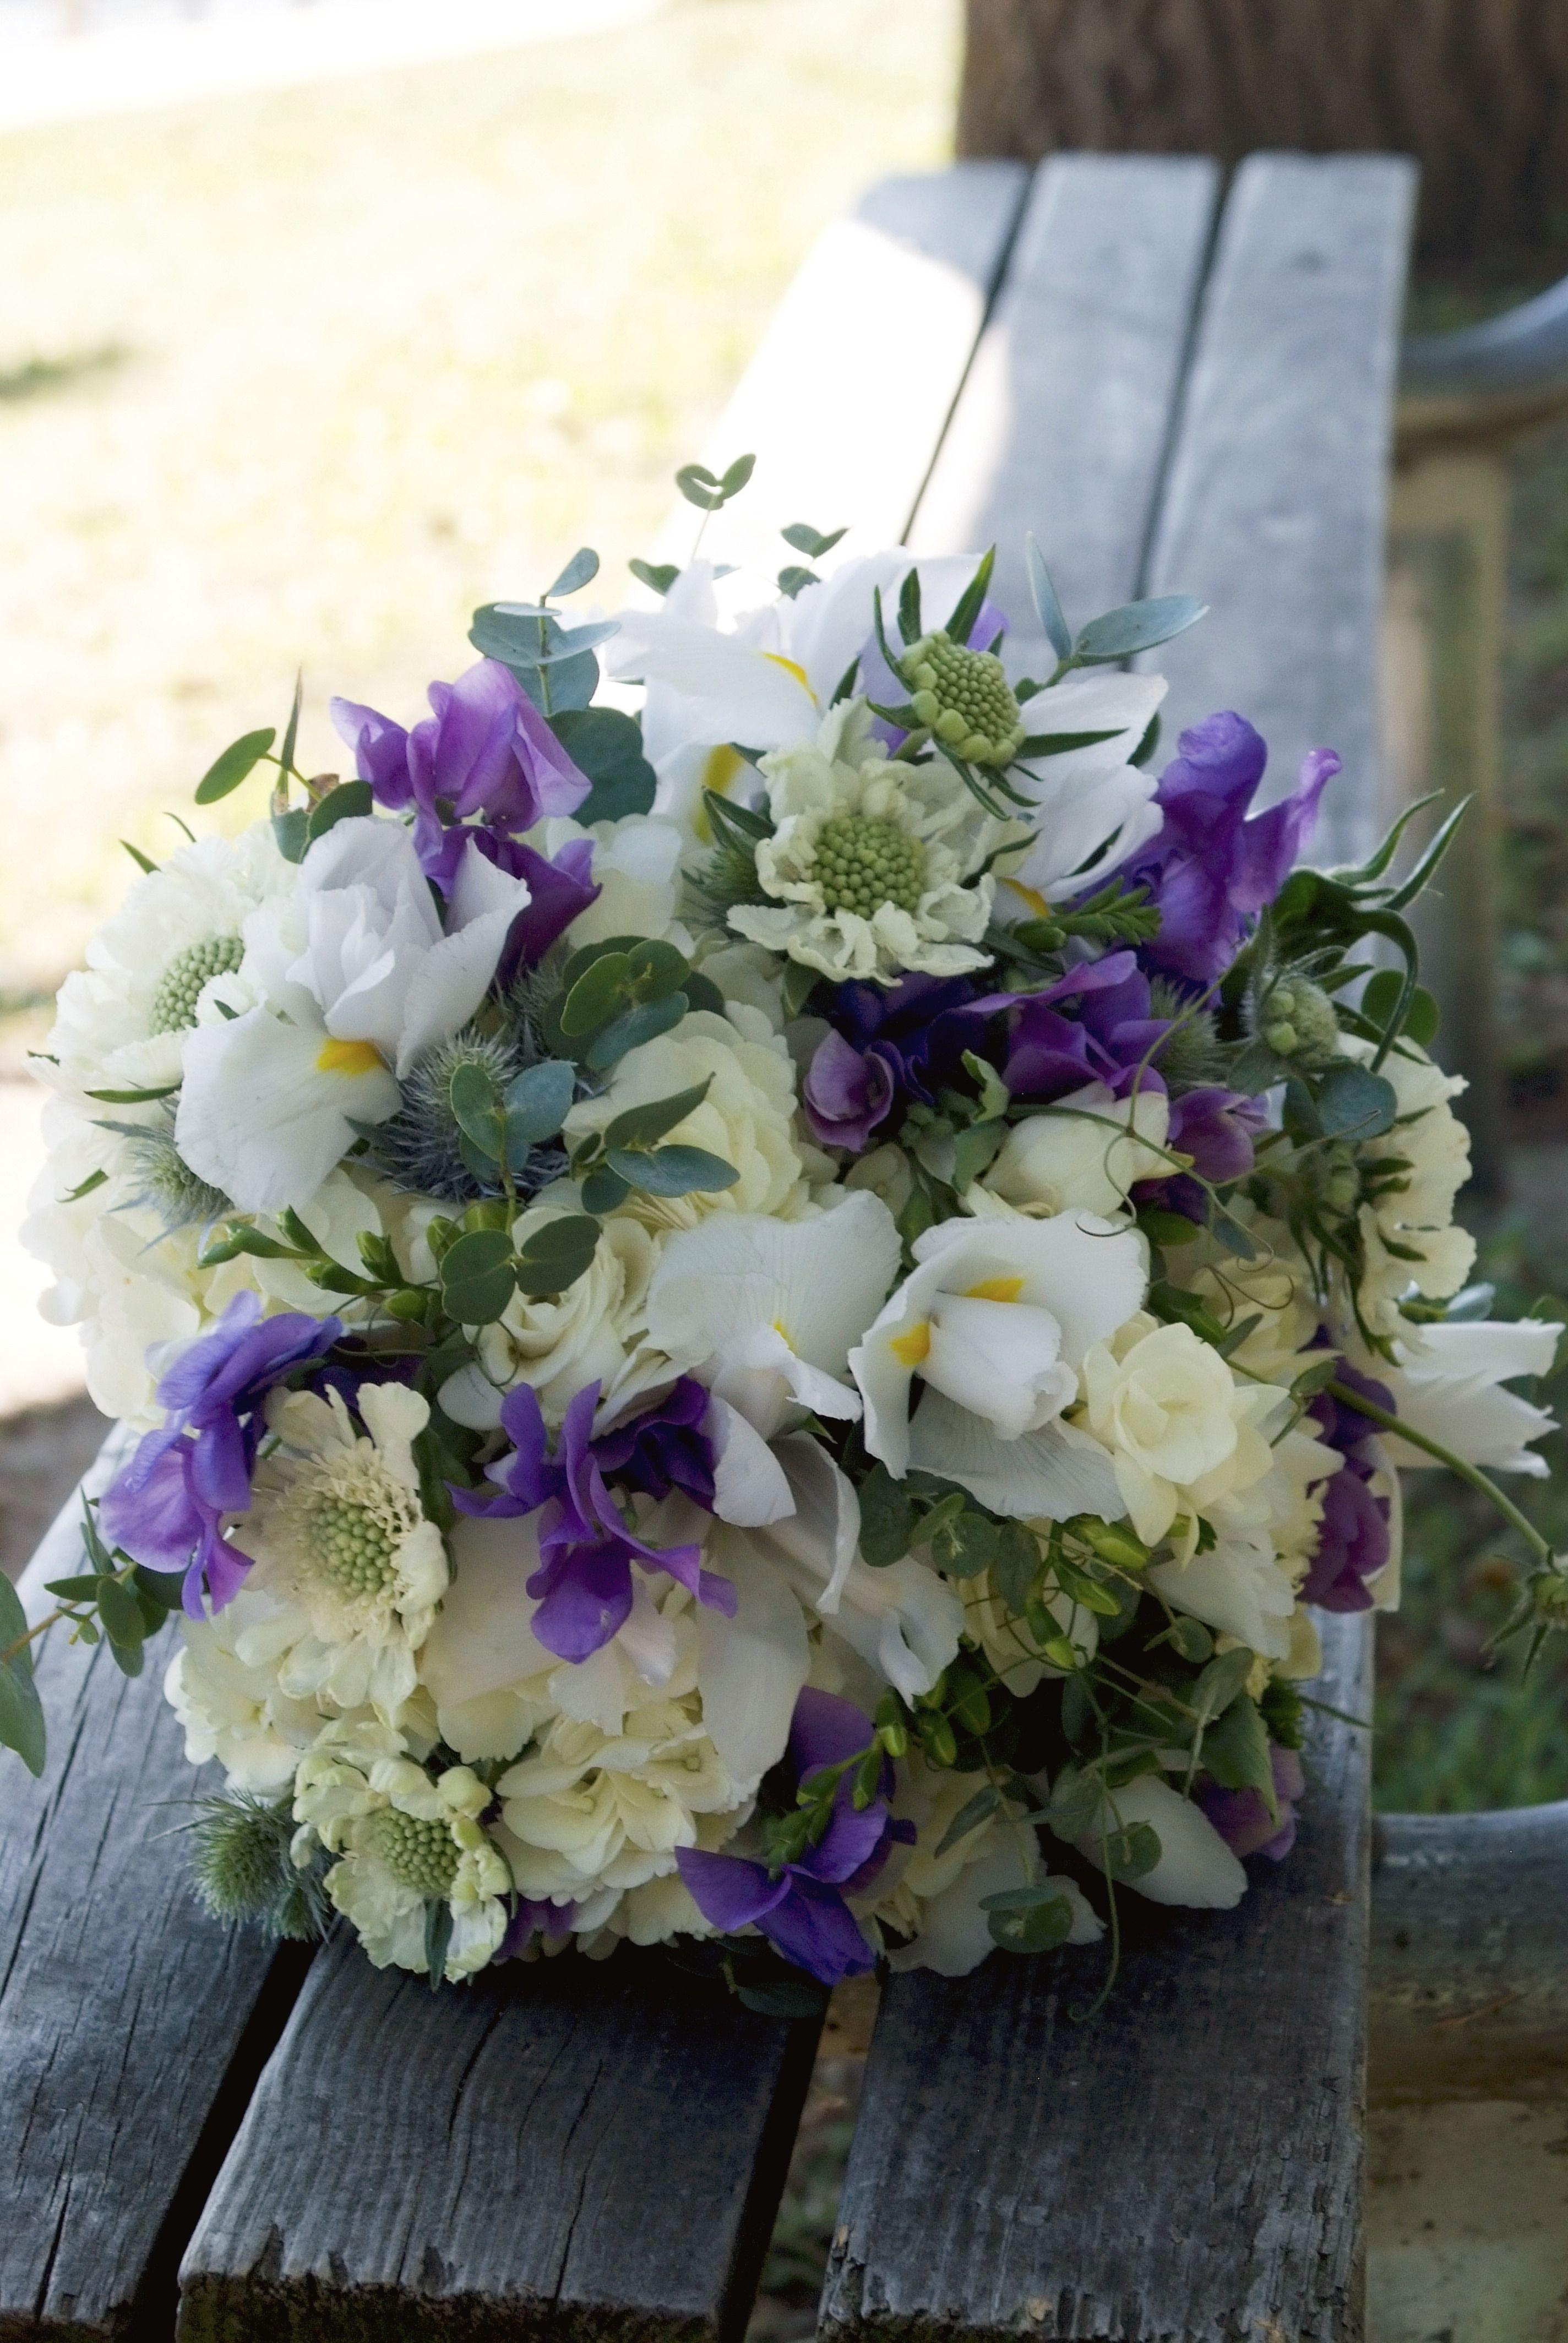 Bridal Bouquet Lilypots Floral Design In Lake Geneva Wi Flowers White And Purple Iris White Scabiosa Blu Wedding Flowers Beautiful Bouquet Bridal Bouquet